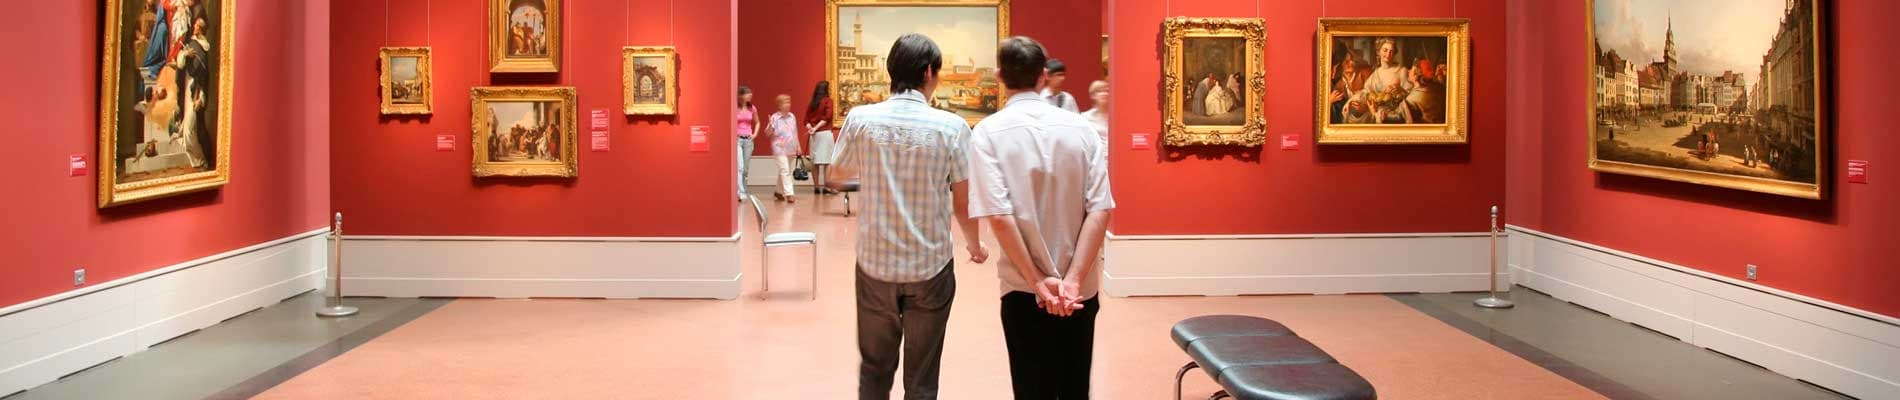 Historia, arqueología e historia del arte